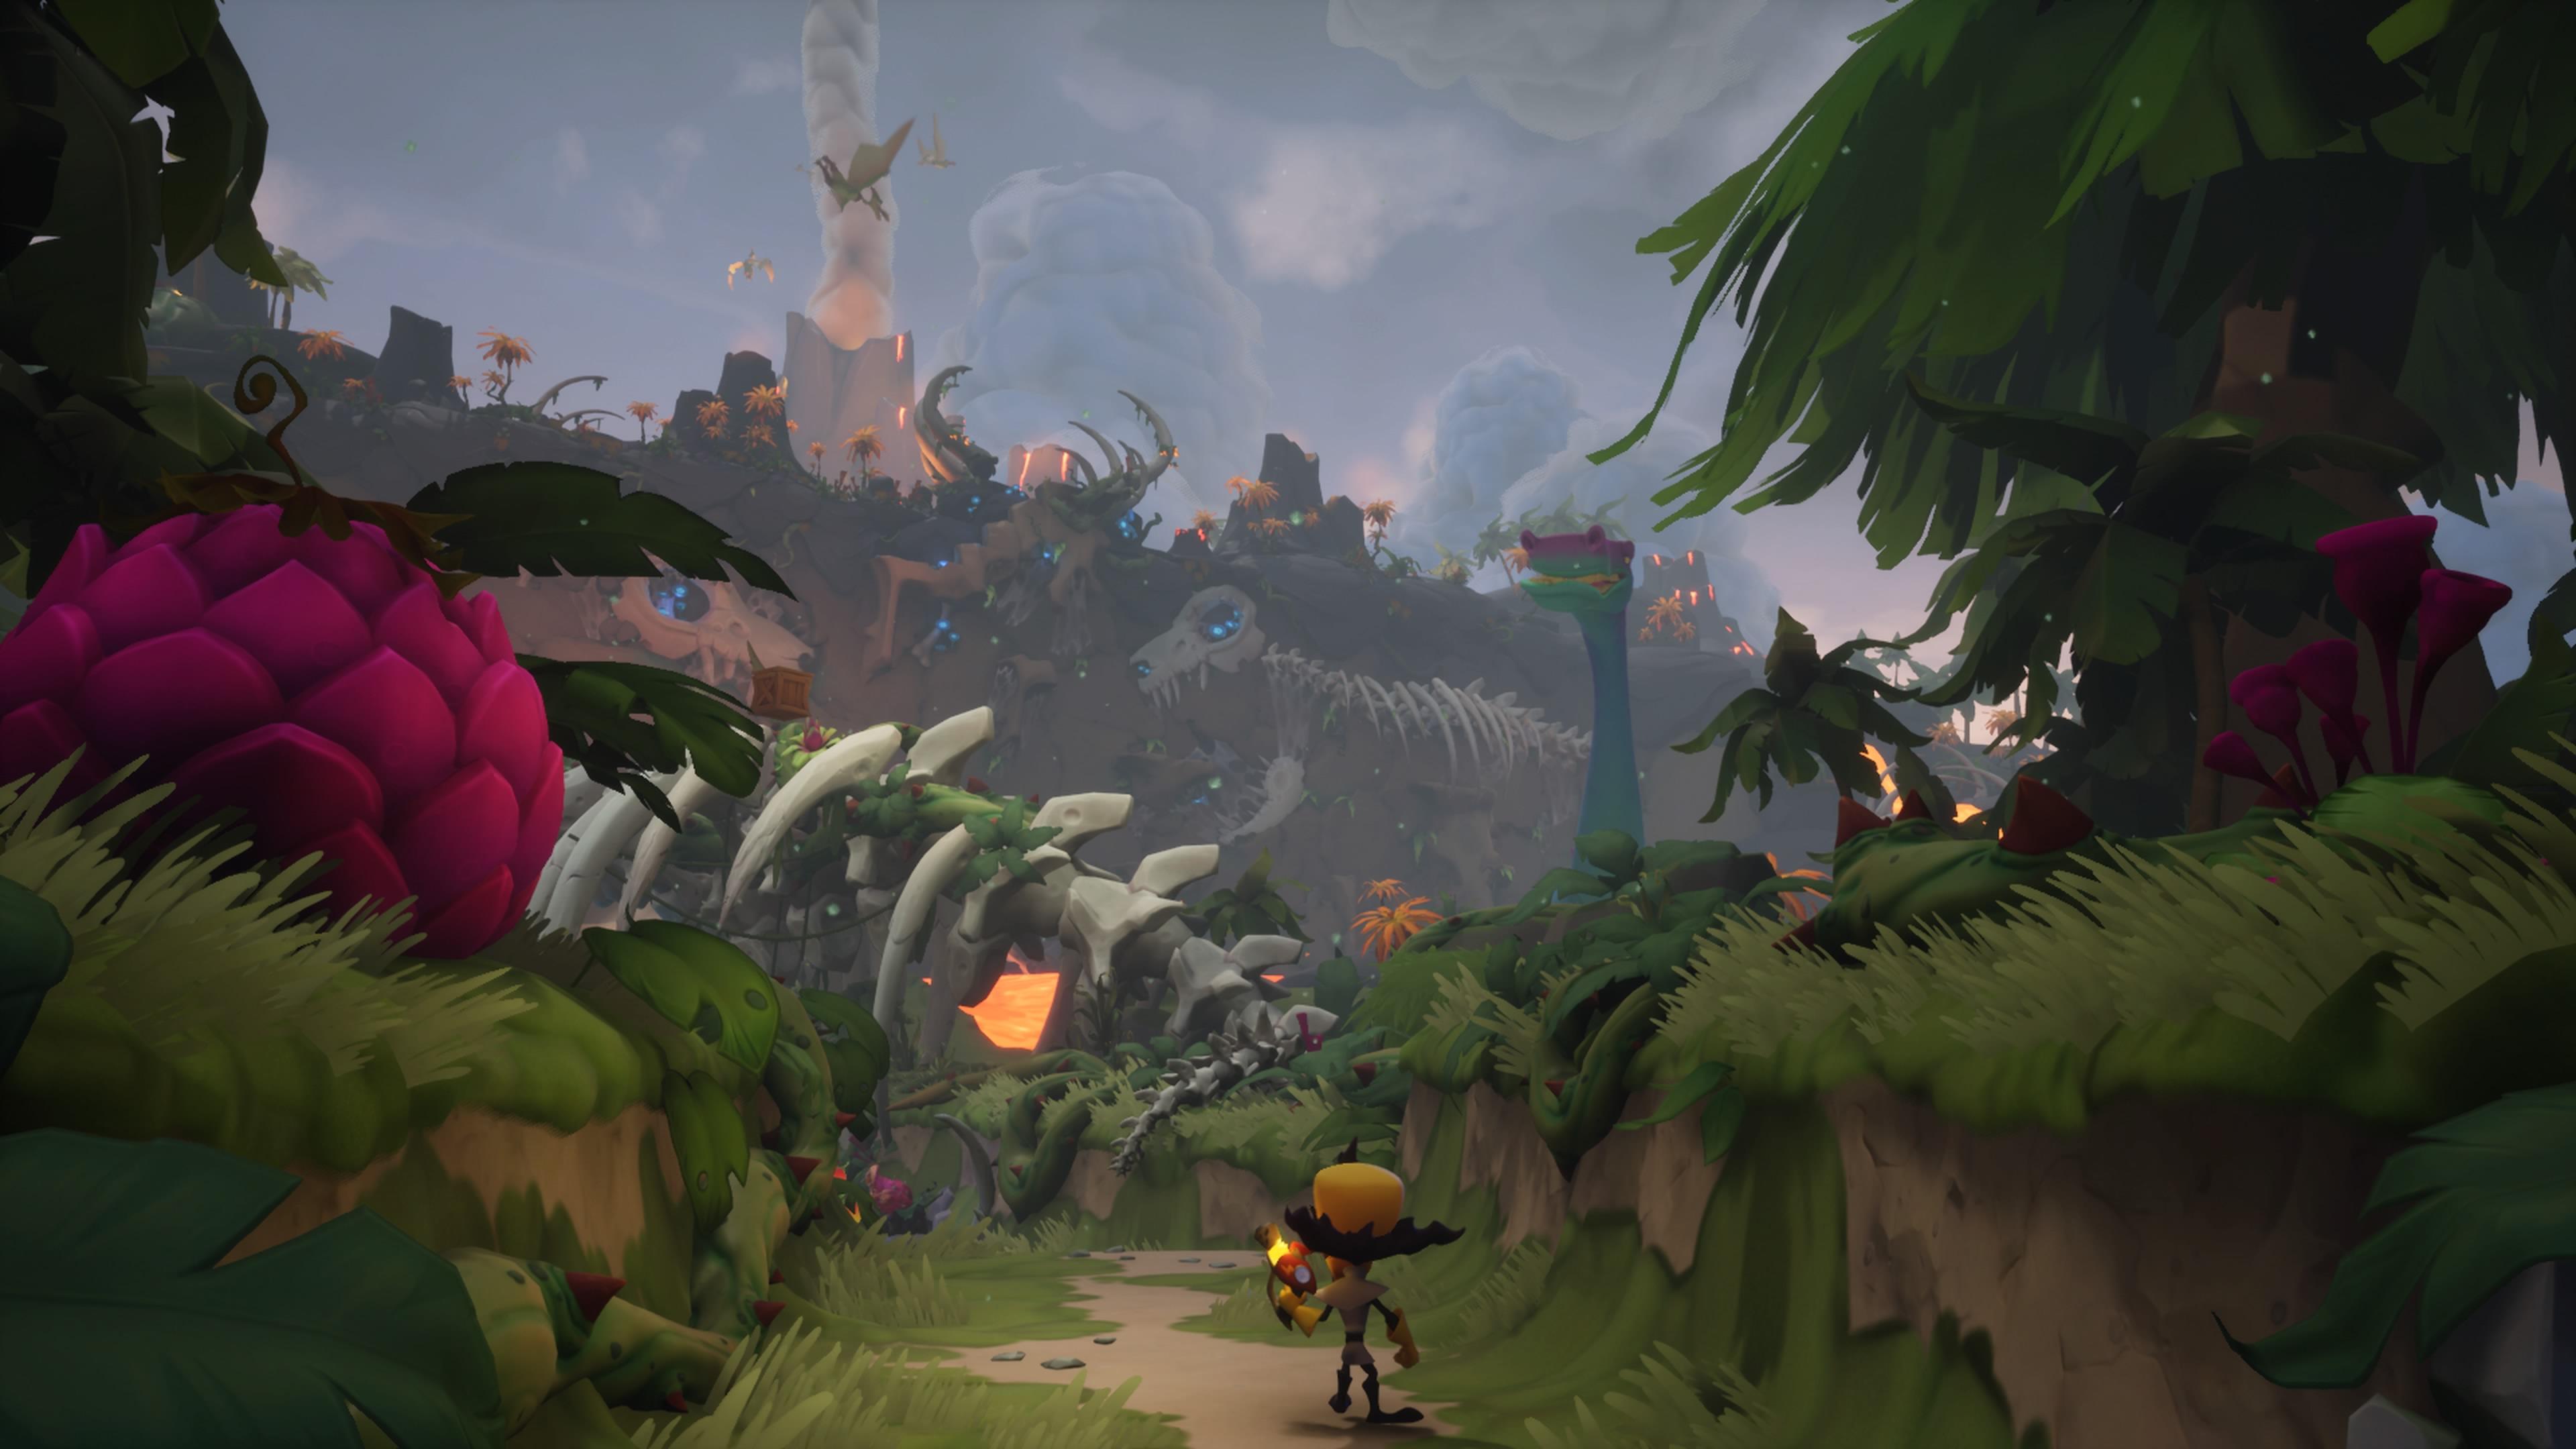 Crash Bandicoot 4: It's About Time Neo Cortex ja dinot